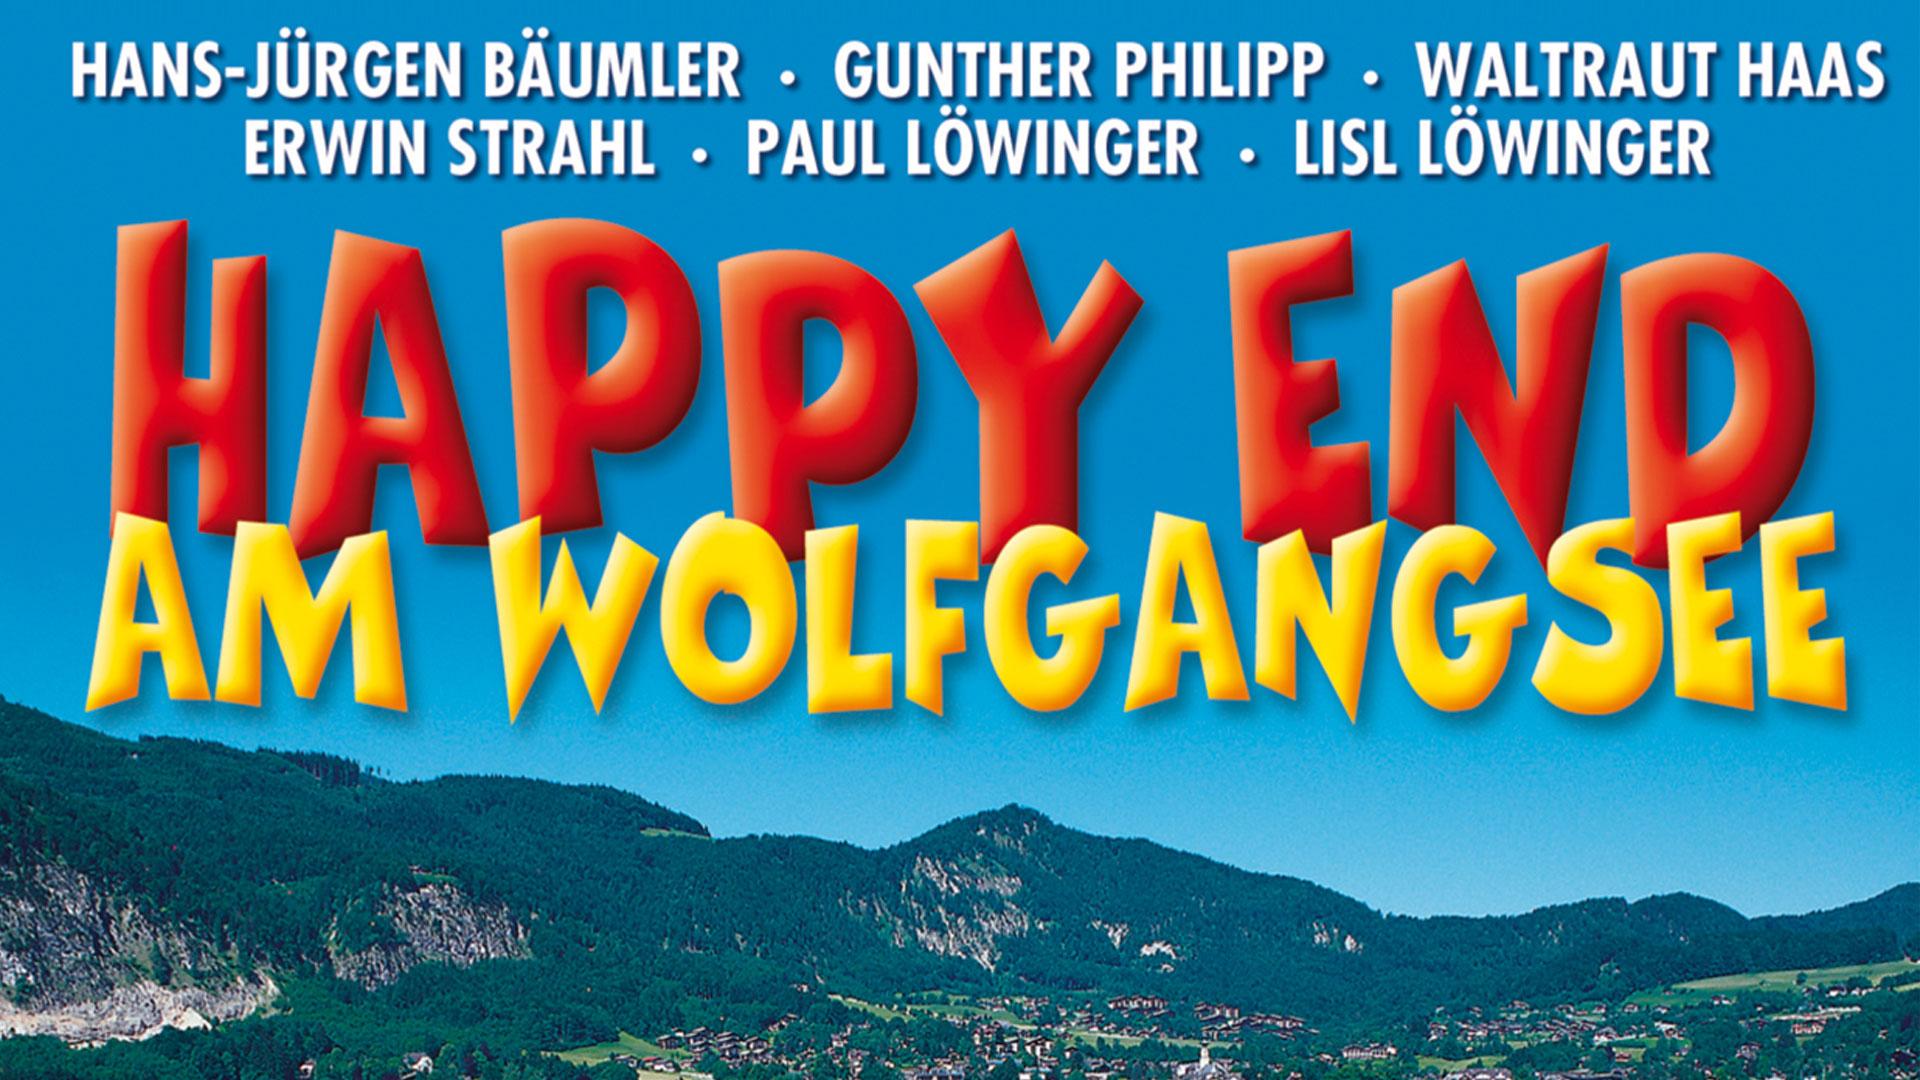 006 am Wolfgangsee - Happy End am Wolfgangsee